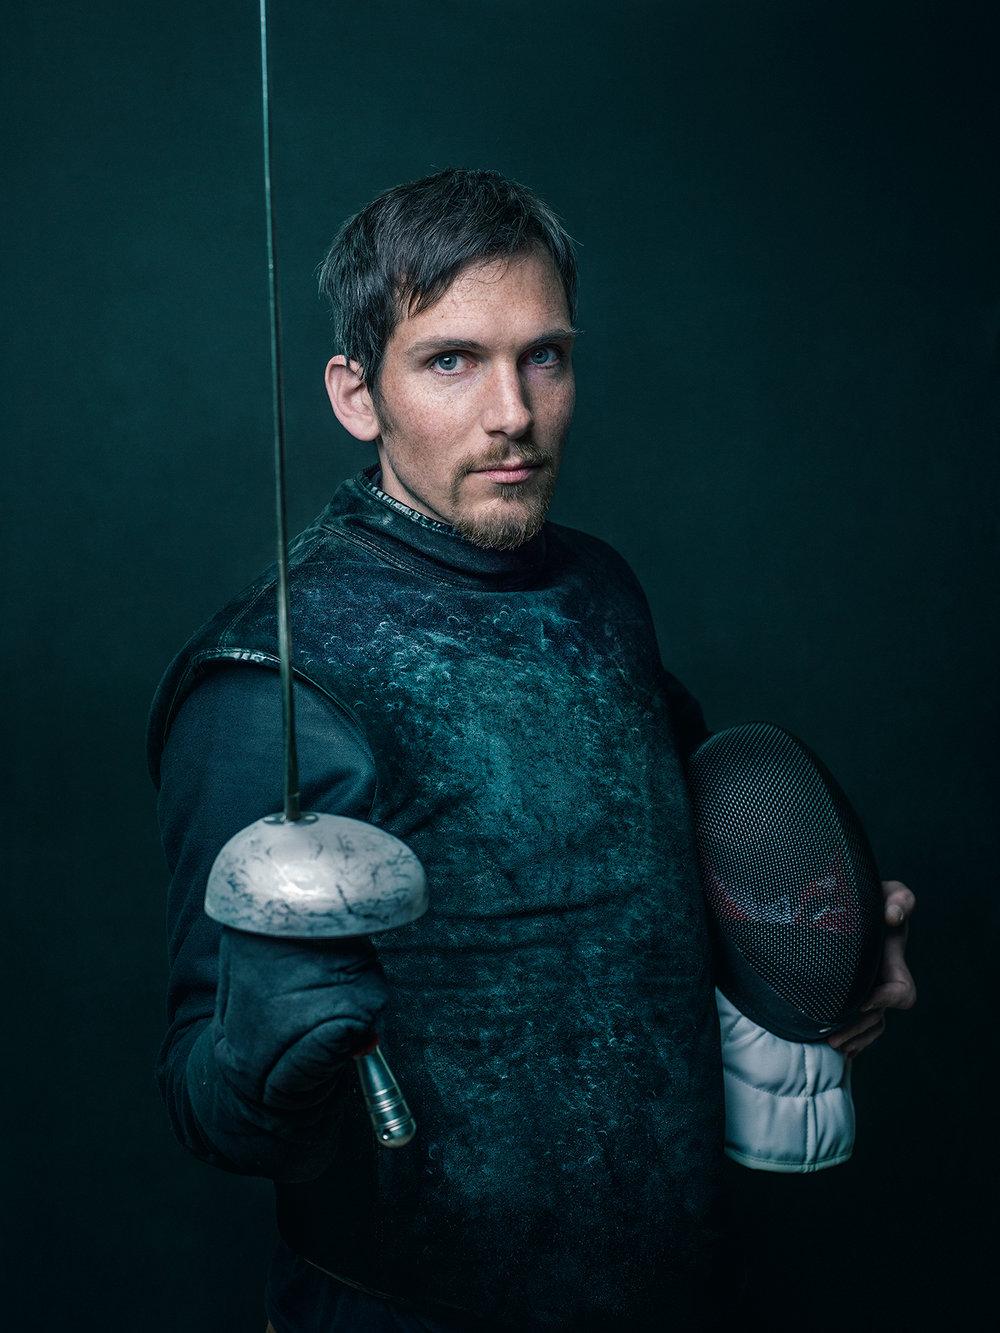 Oscar-arribas-esgrima-maestro-fencing-master-fencer-fechten-scherma-escrime-portrait-fotografo-retrato-photographer024.jpg